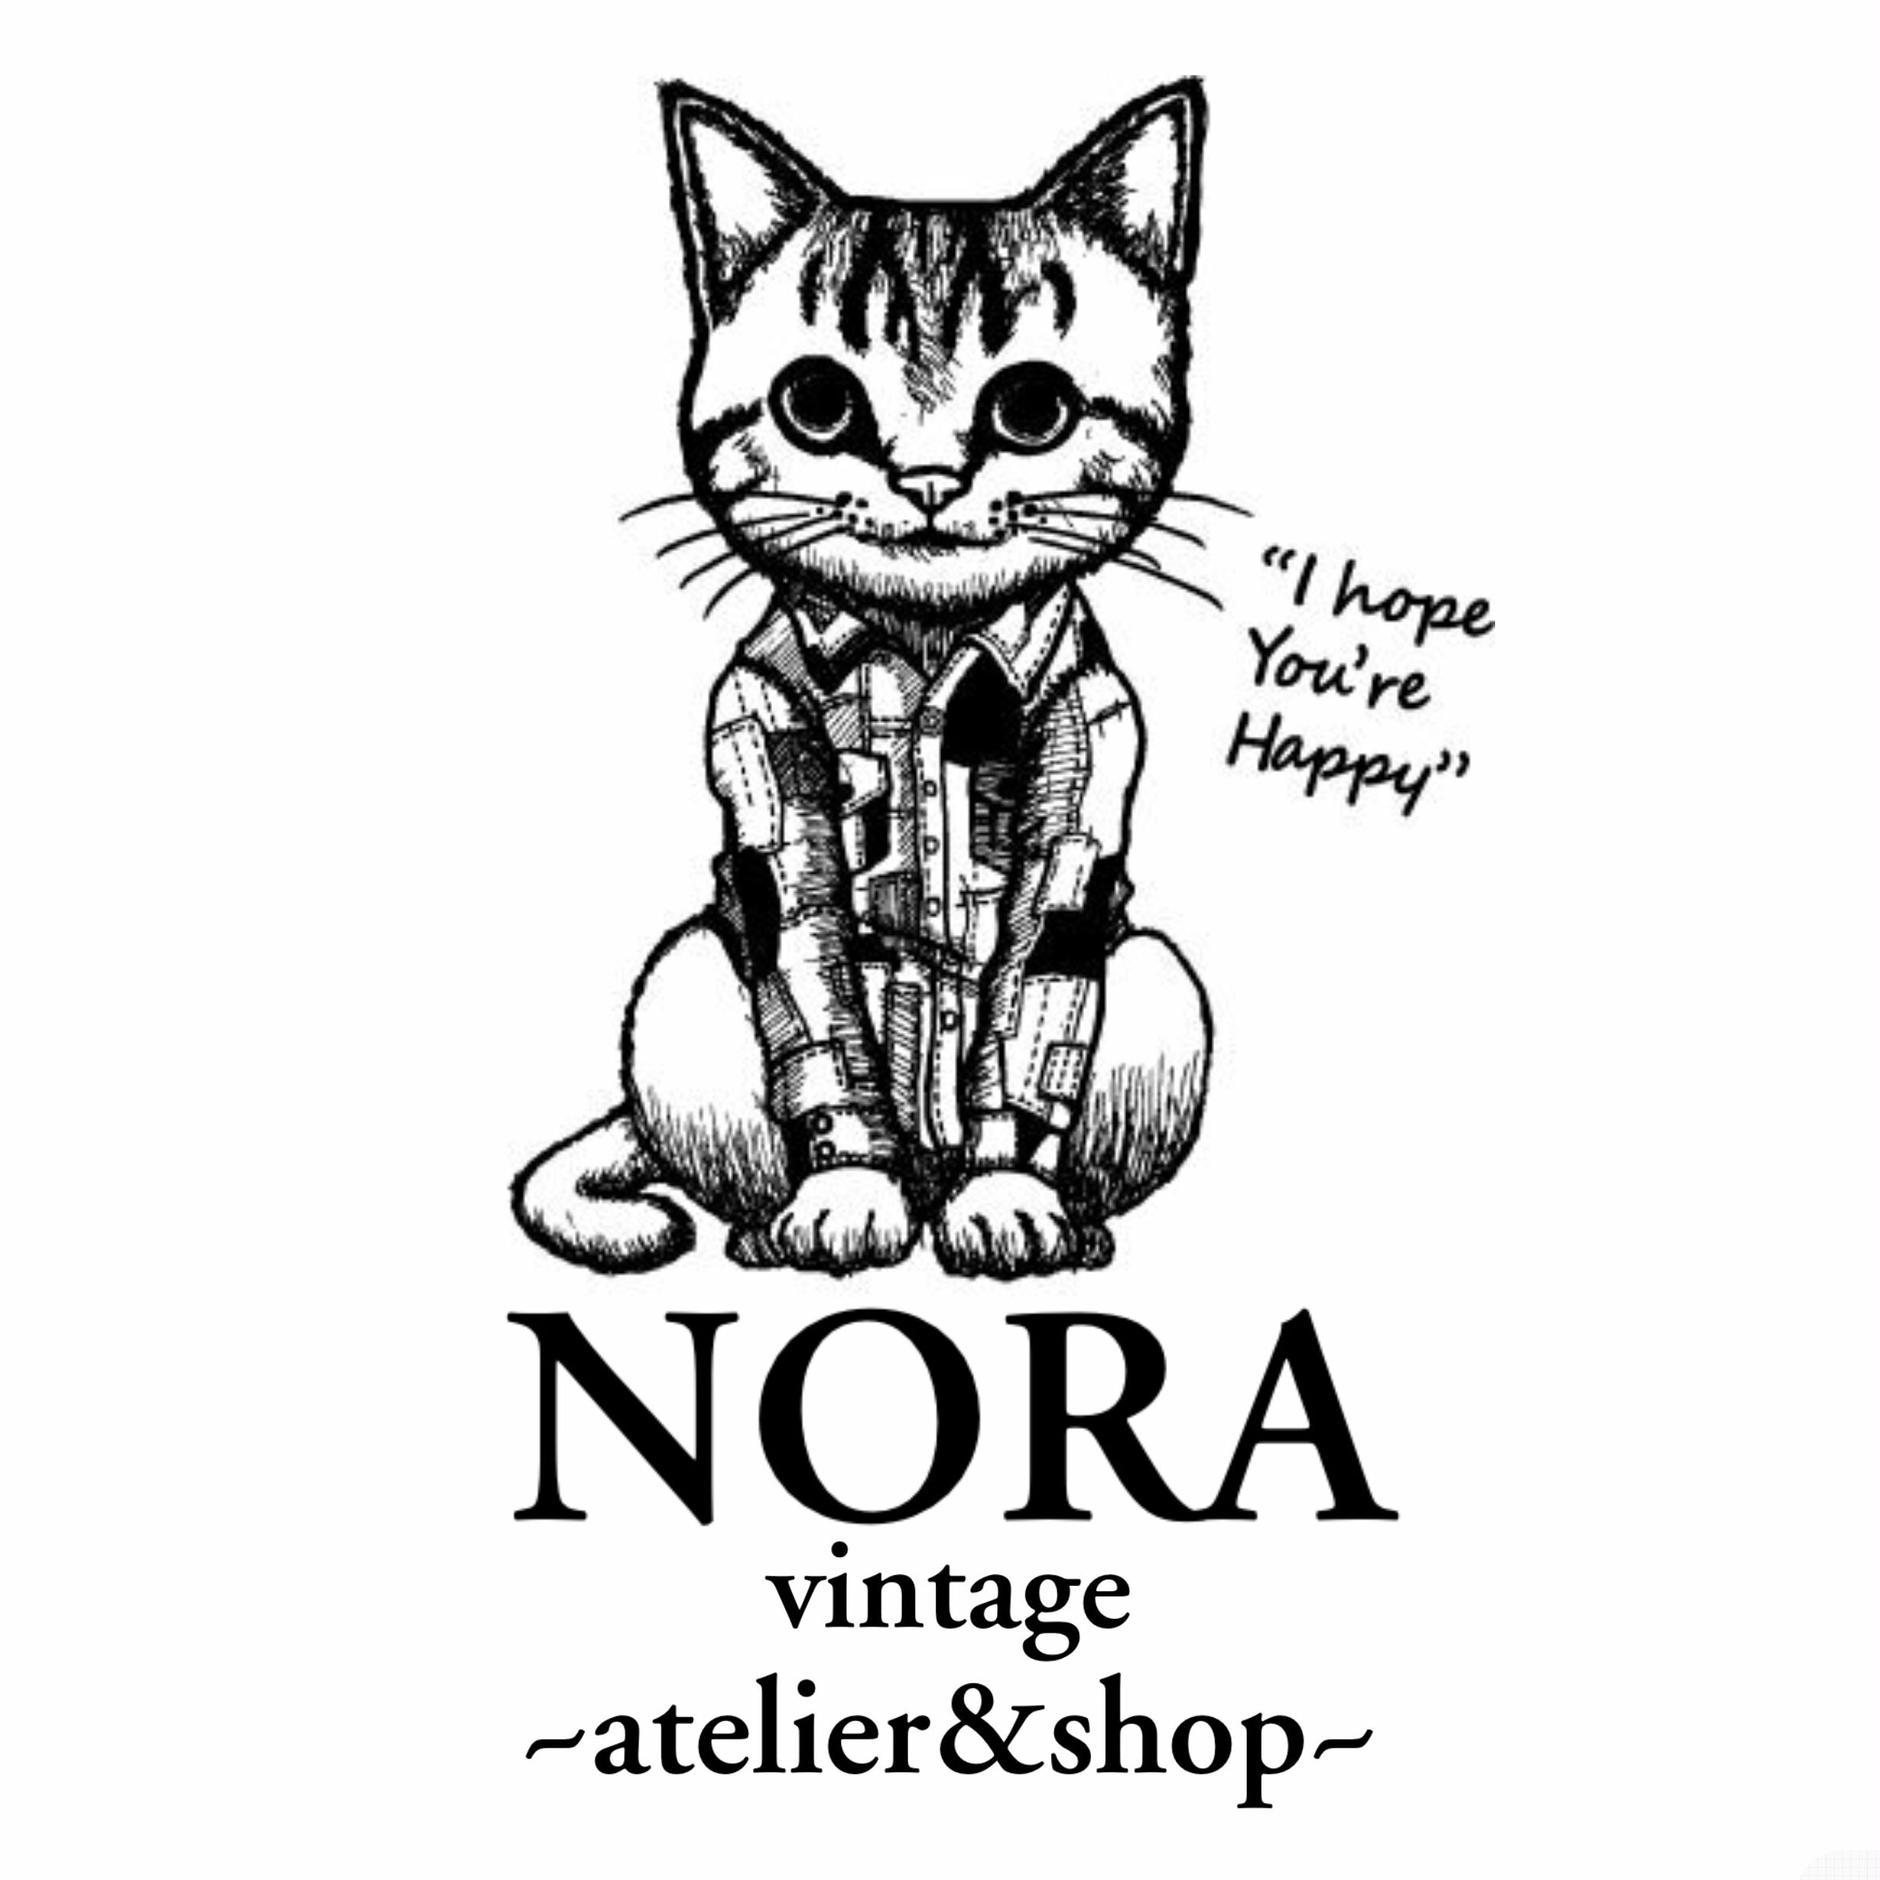 NORA vintage~ atelier&shop~